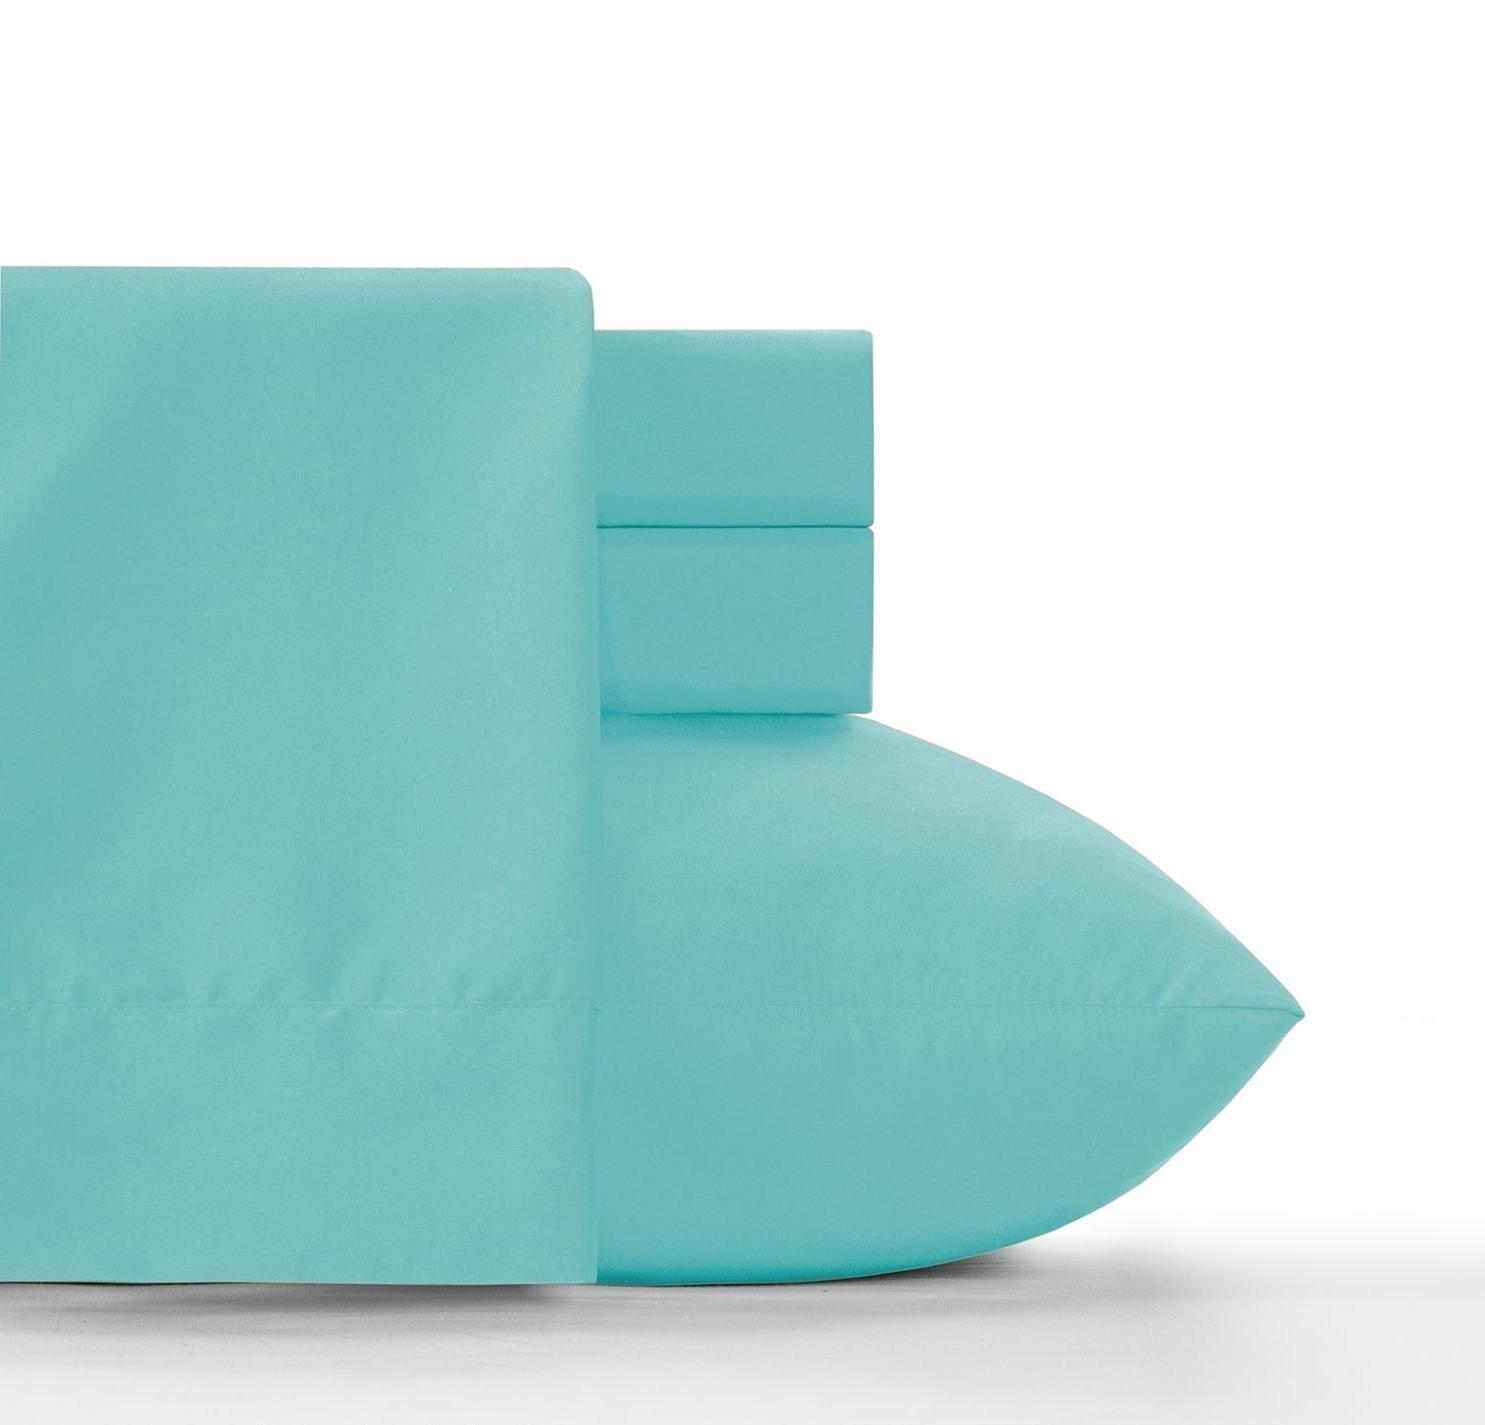 Du 4pc Girls Robin's Egg Blue Queen Sheet Set, Light Blue Solid Color Pattern Deep Pocket Design, Luxurious Traditional Bright Colorful Themed Teen, Microfiber Polyester, Kids Bedding Bedroom